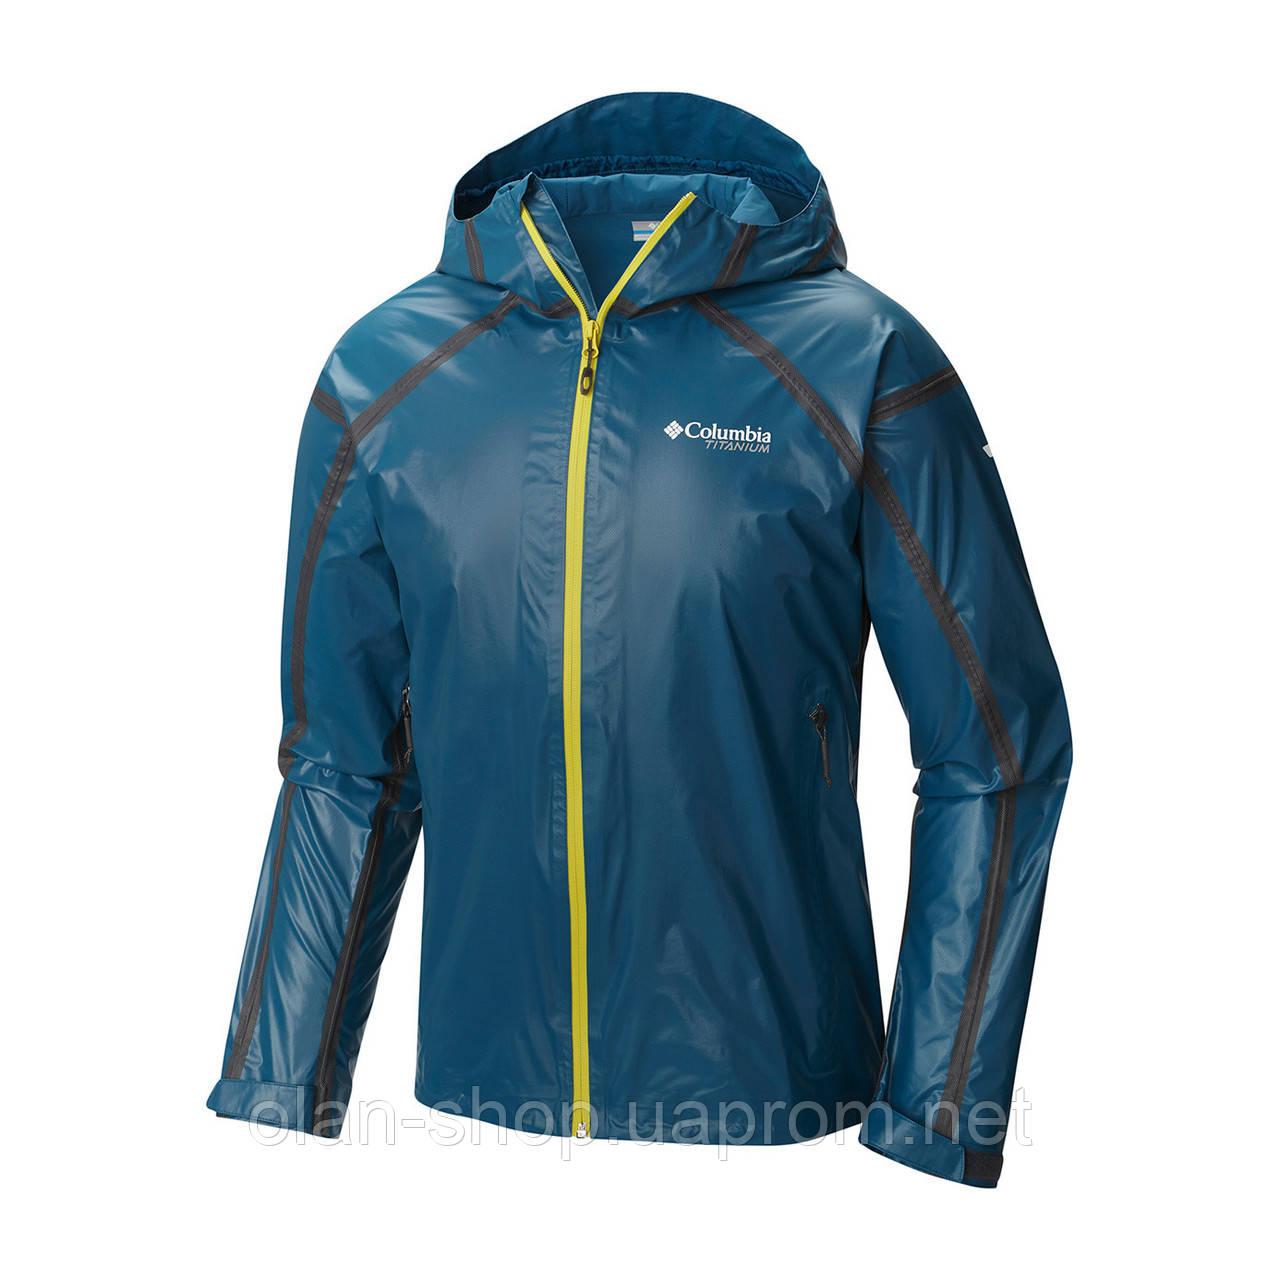 Мужская куртка Columbia Sportswear OutDry Omni-Heat Extreme Gold Jacket -  OlaN в Киеве 7cc4c8b512817